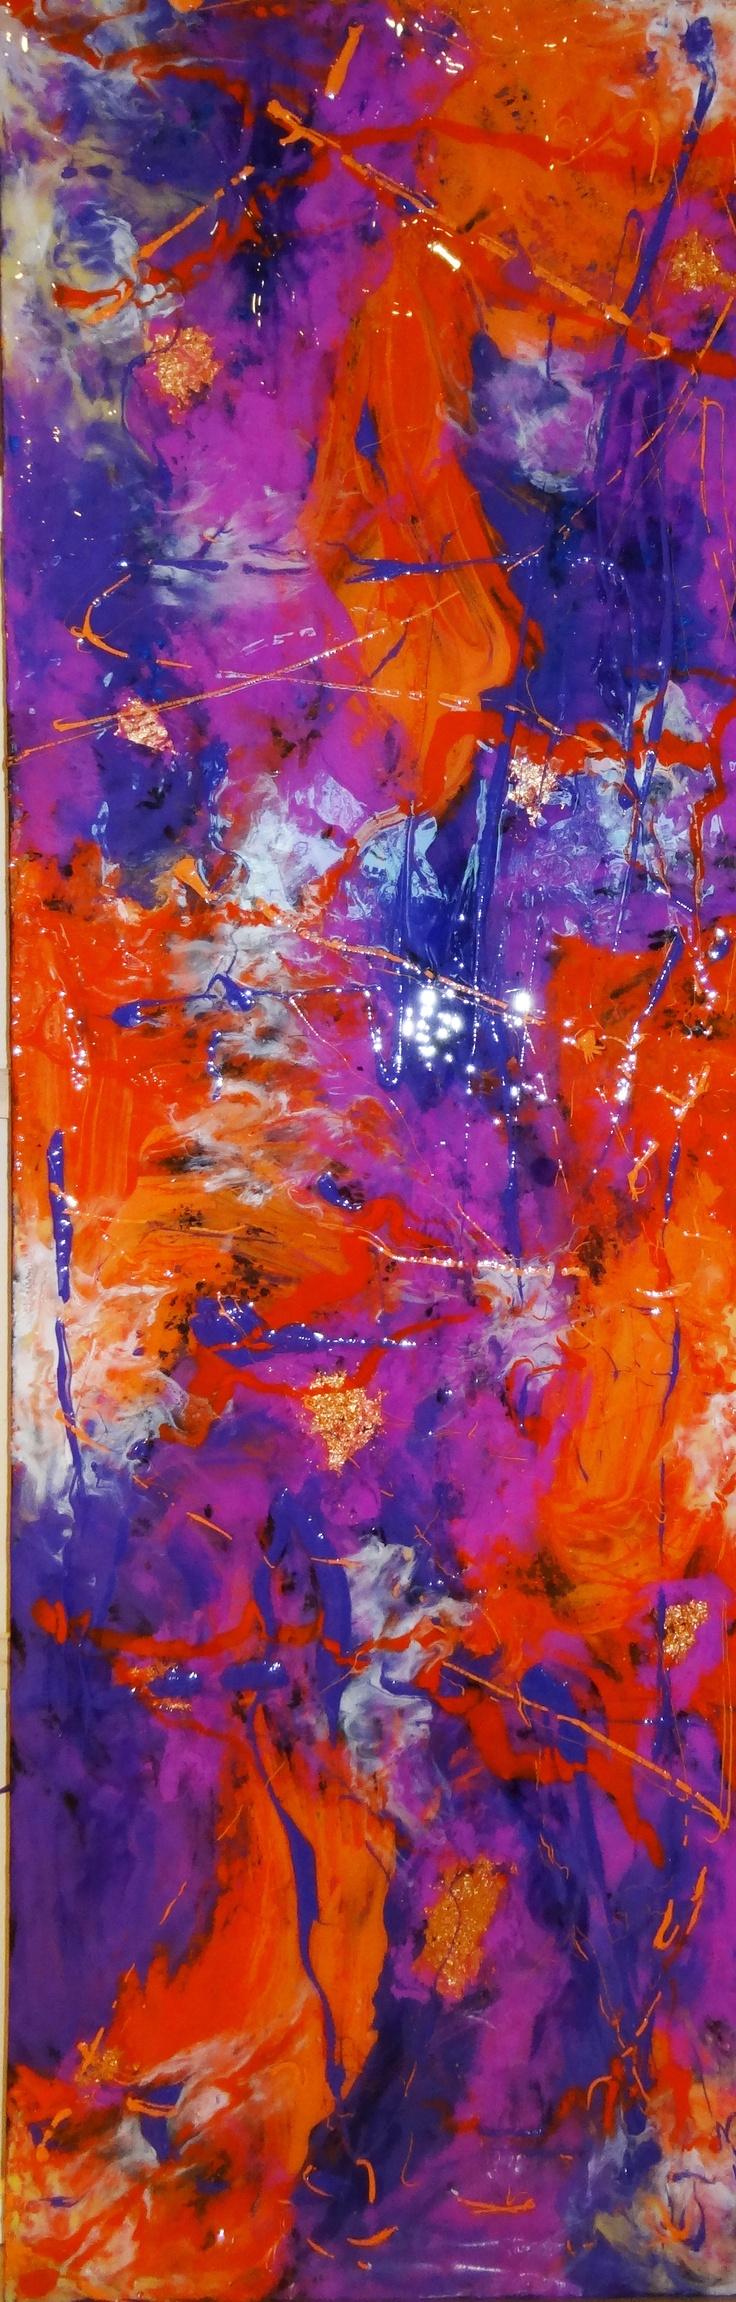 Pin By Marsha Gulick On 761 Lisafrankstyle Bright Cyans Orange Pink Purple Red Mix Colorblock Cysorpkplrdyeorrd Jewel Purple Art Painting Bedroom Colors Purple